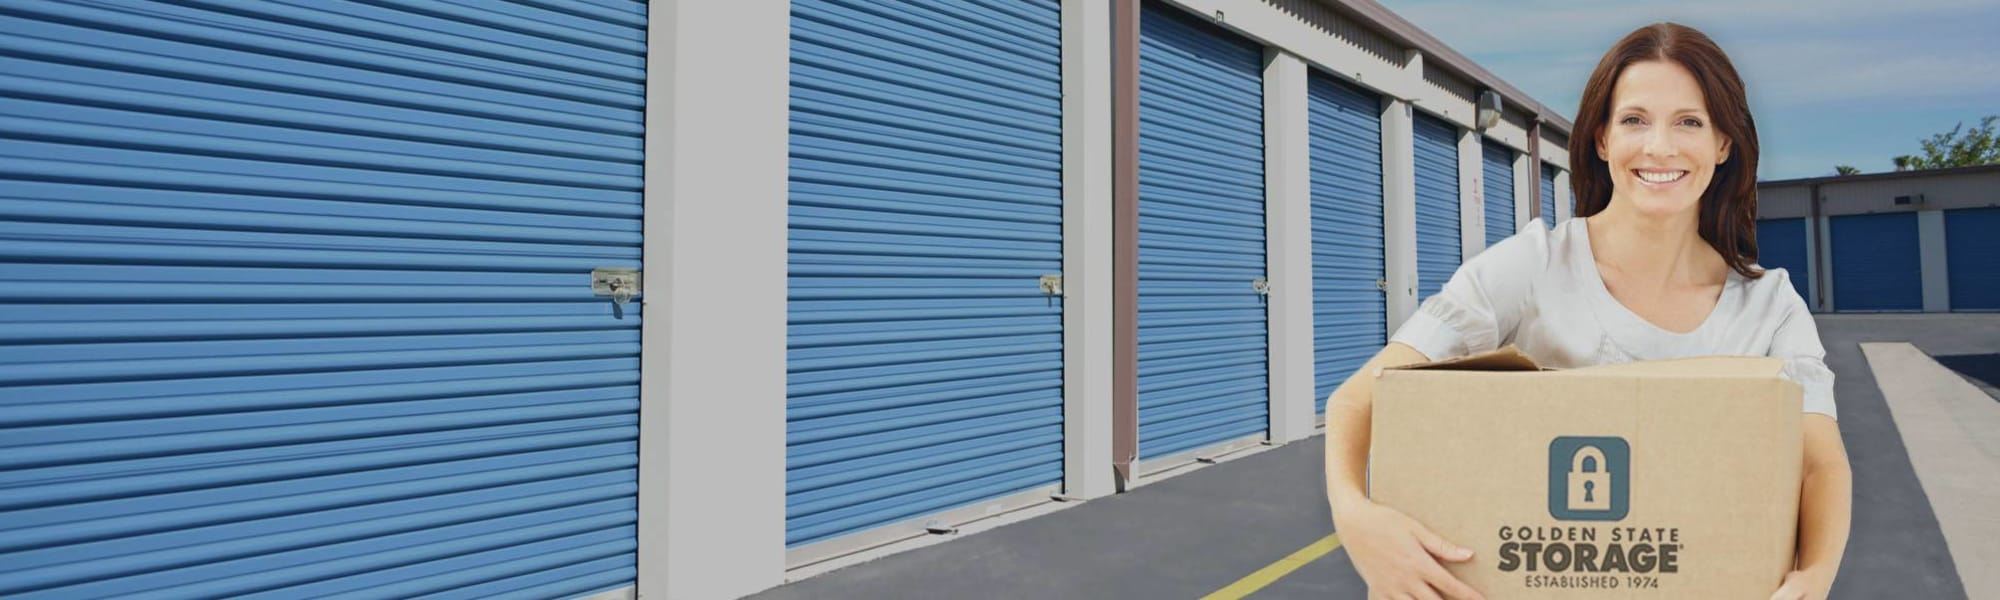 Reviews of Golden State Storage - Oak Avenue in Santa Clarita, California